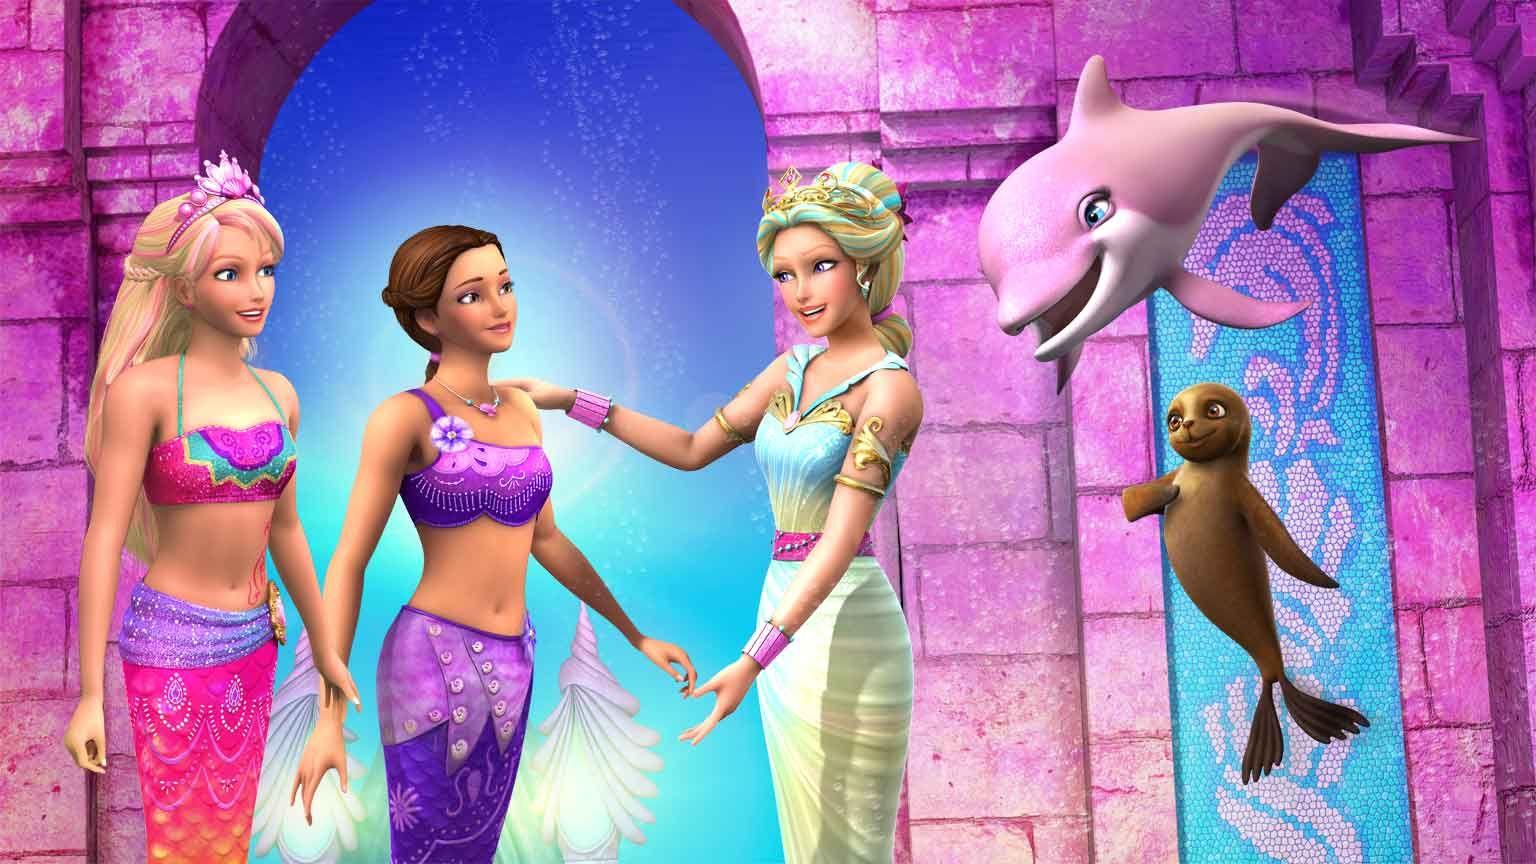 Mermaid Tale 2 | Barbie ♡ | Pinterest | películas de Barbie, Barbie ...